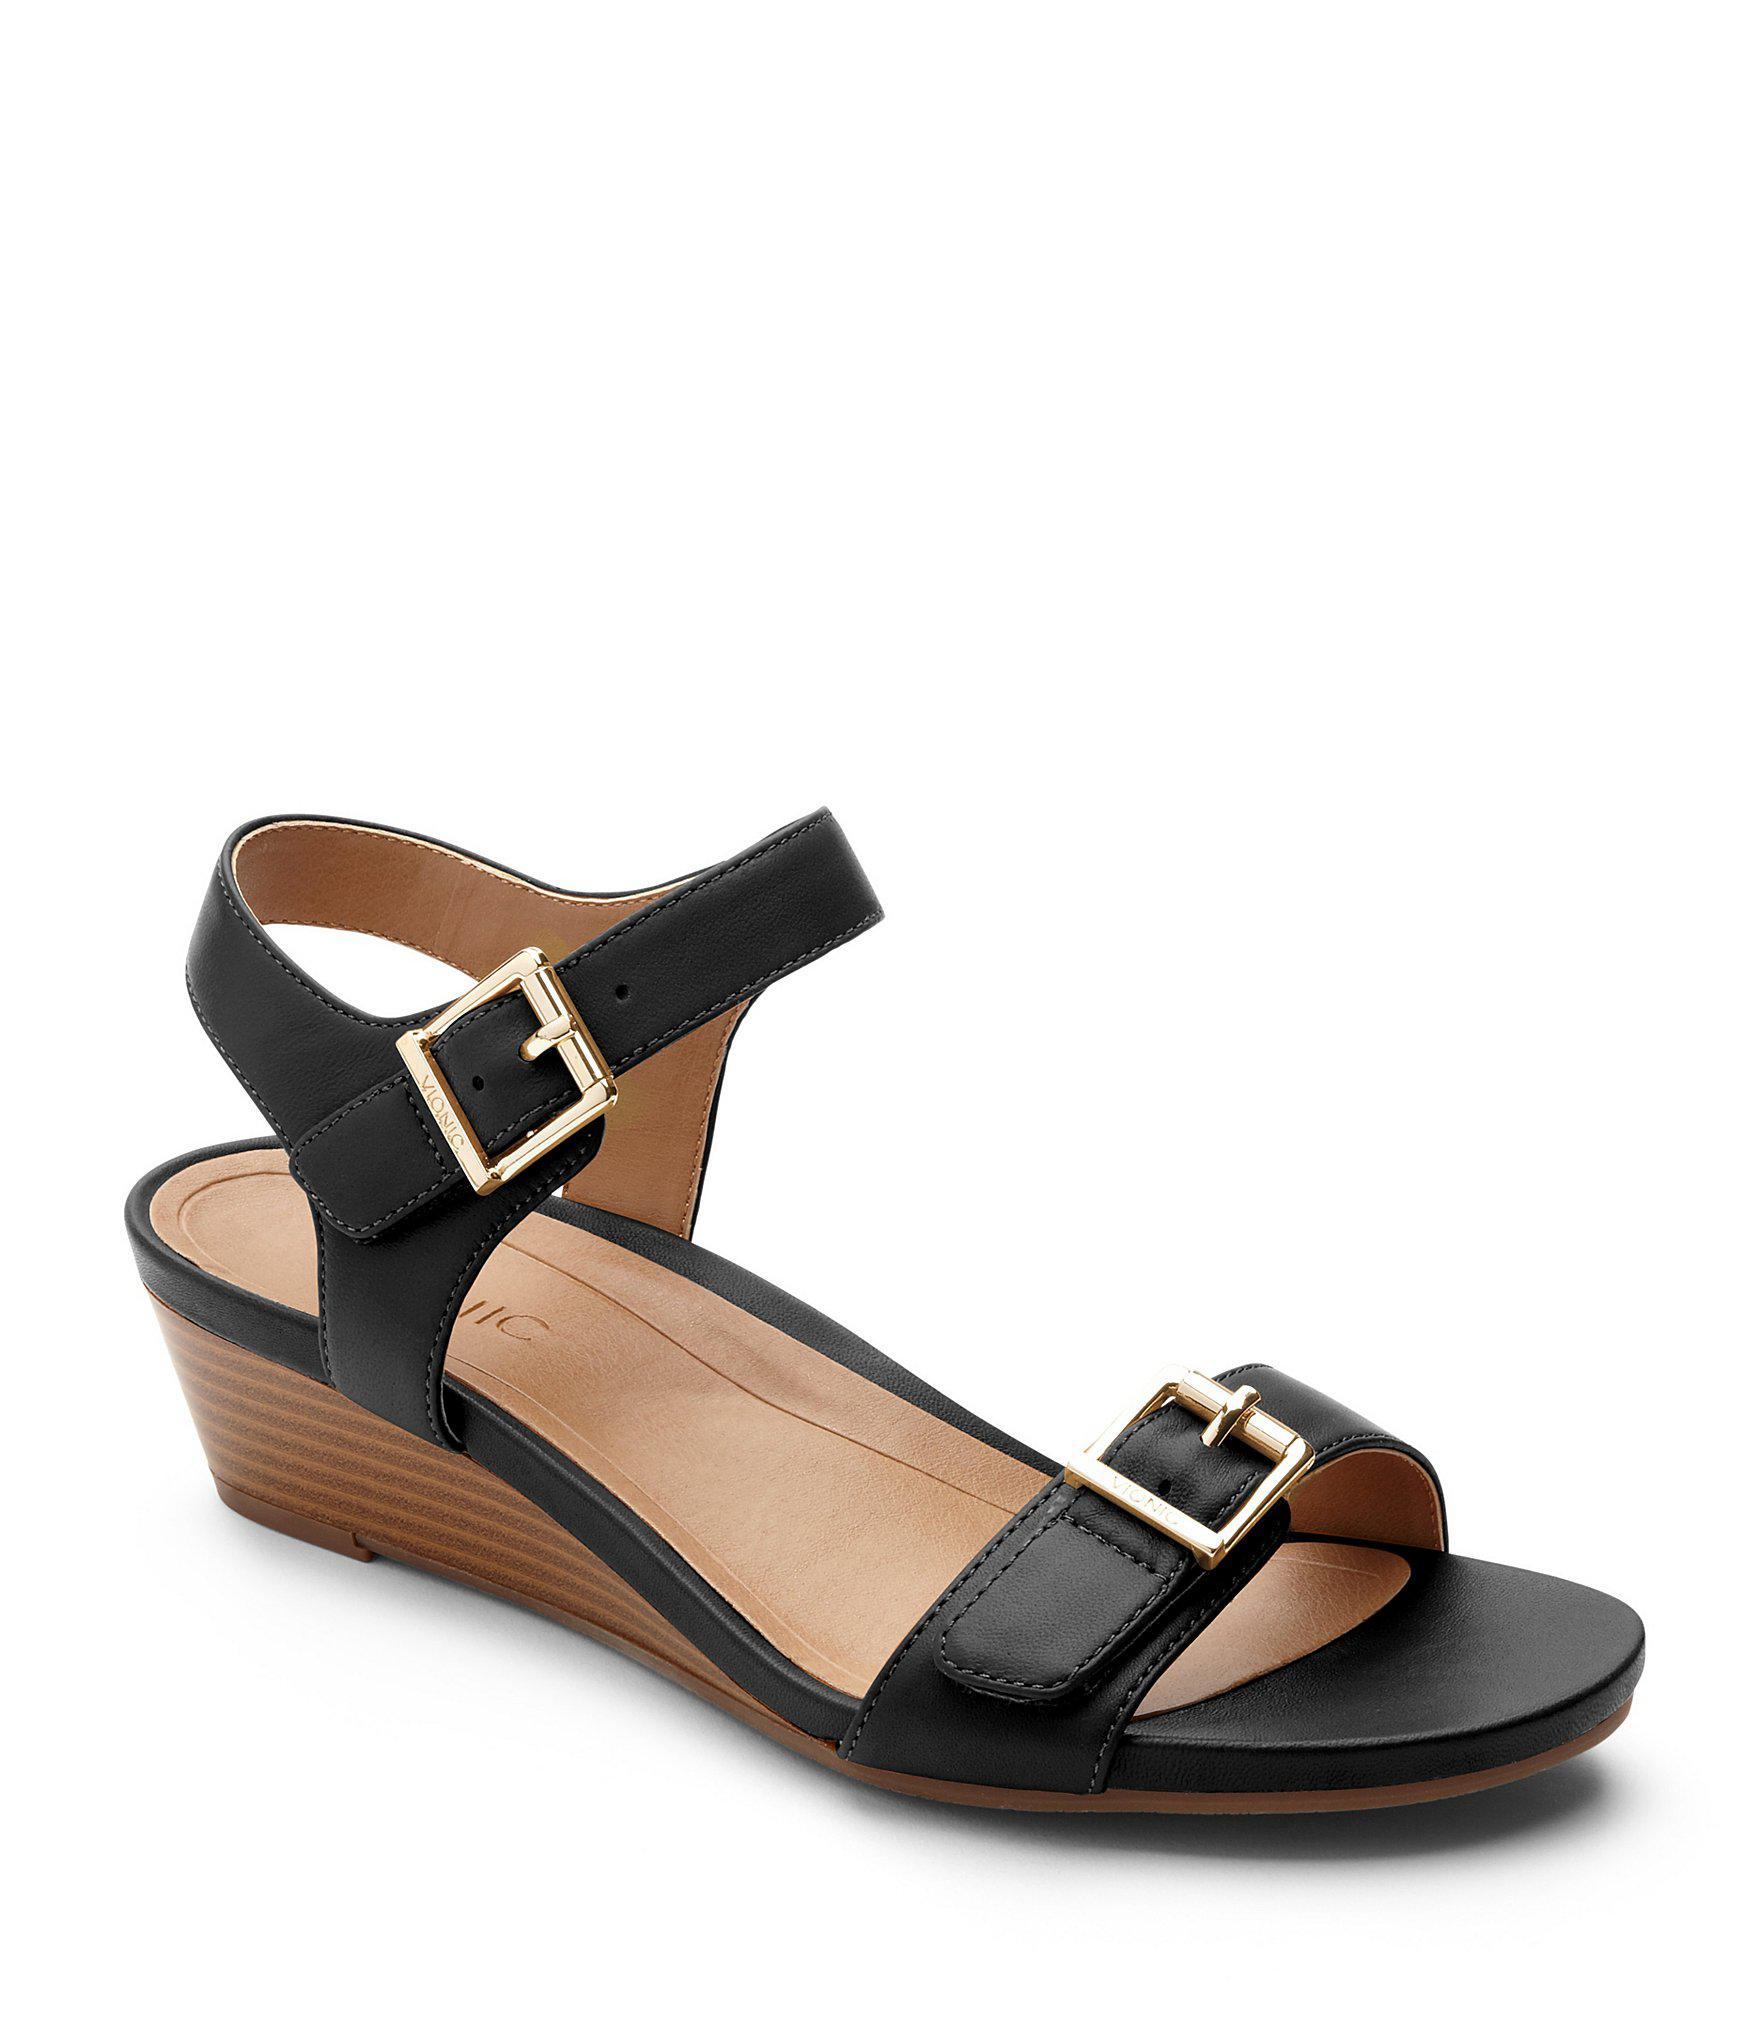 e85cd4ff724c9c Lyst - Vionic Port Frances Wedge Sandals in Black